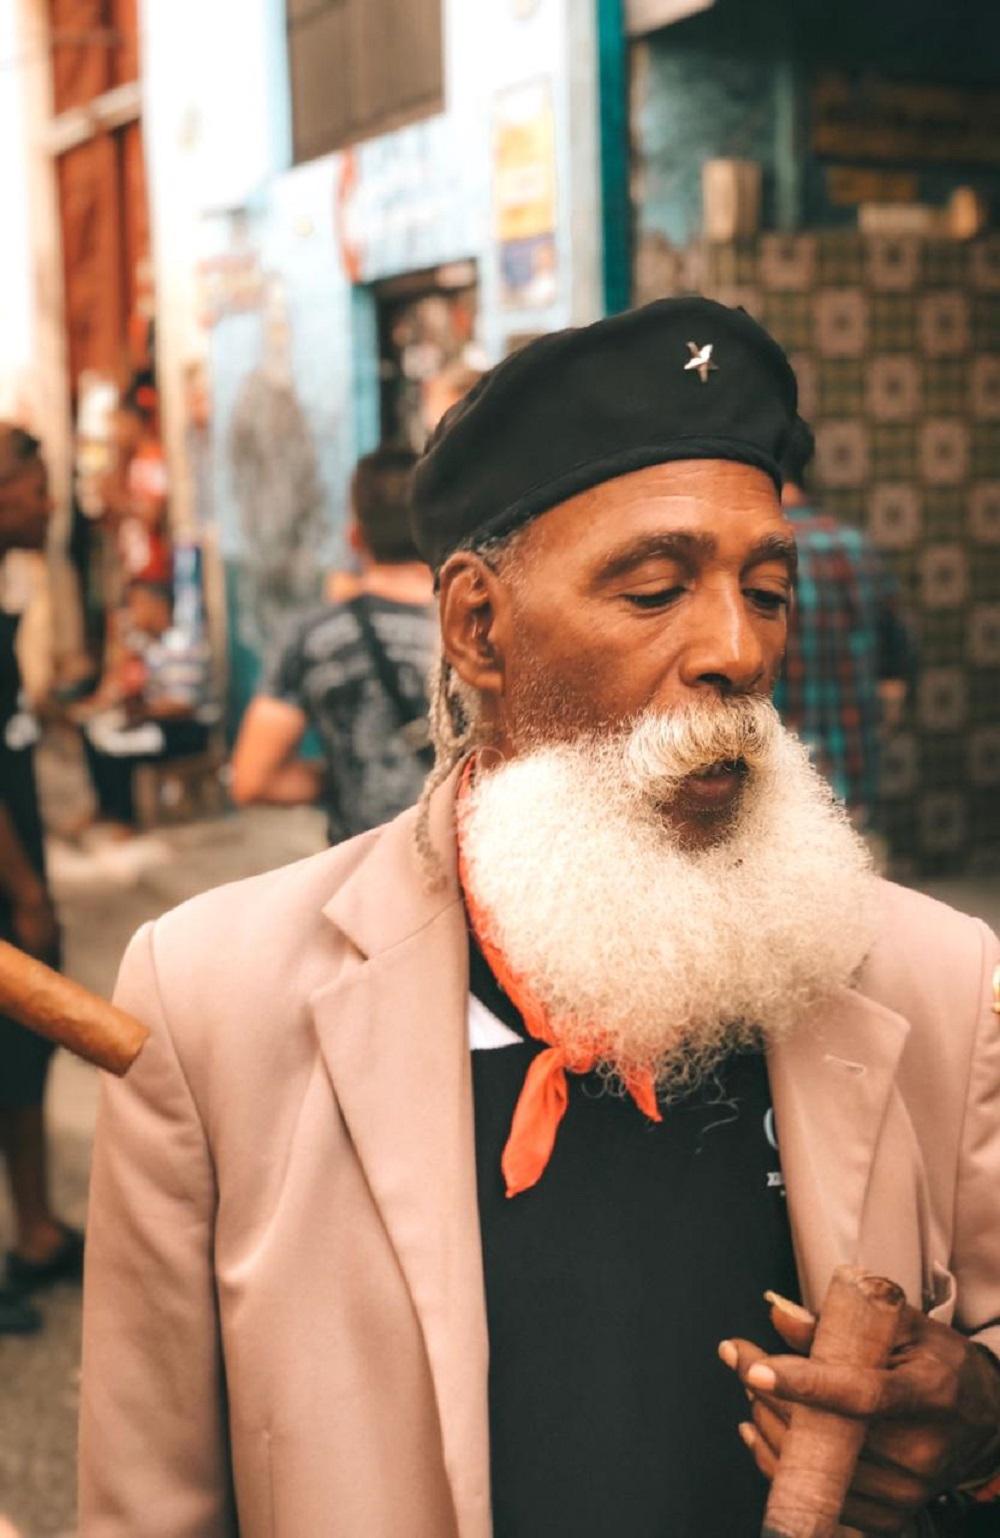 Cubano com trajes típicos (Foto: Tati Sisti)